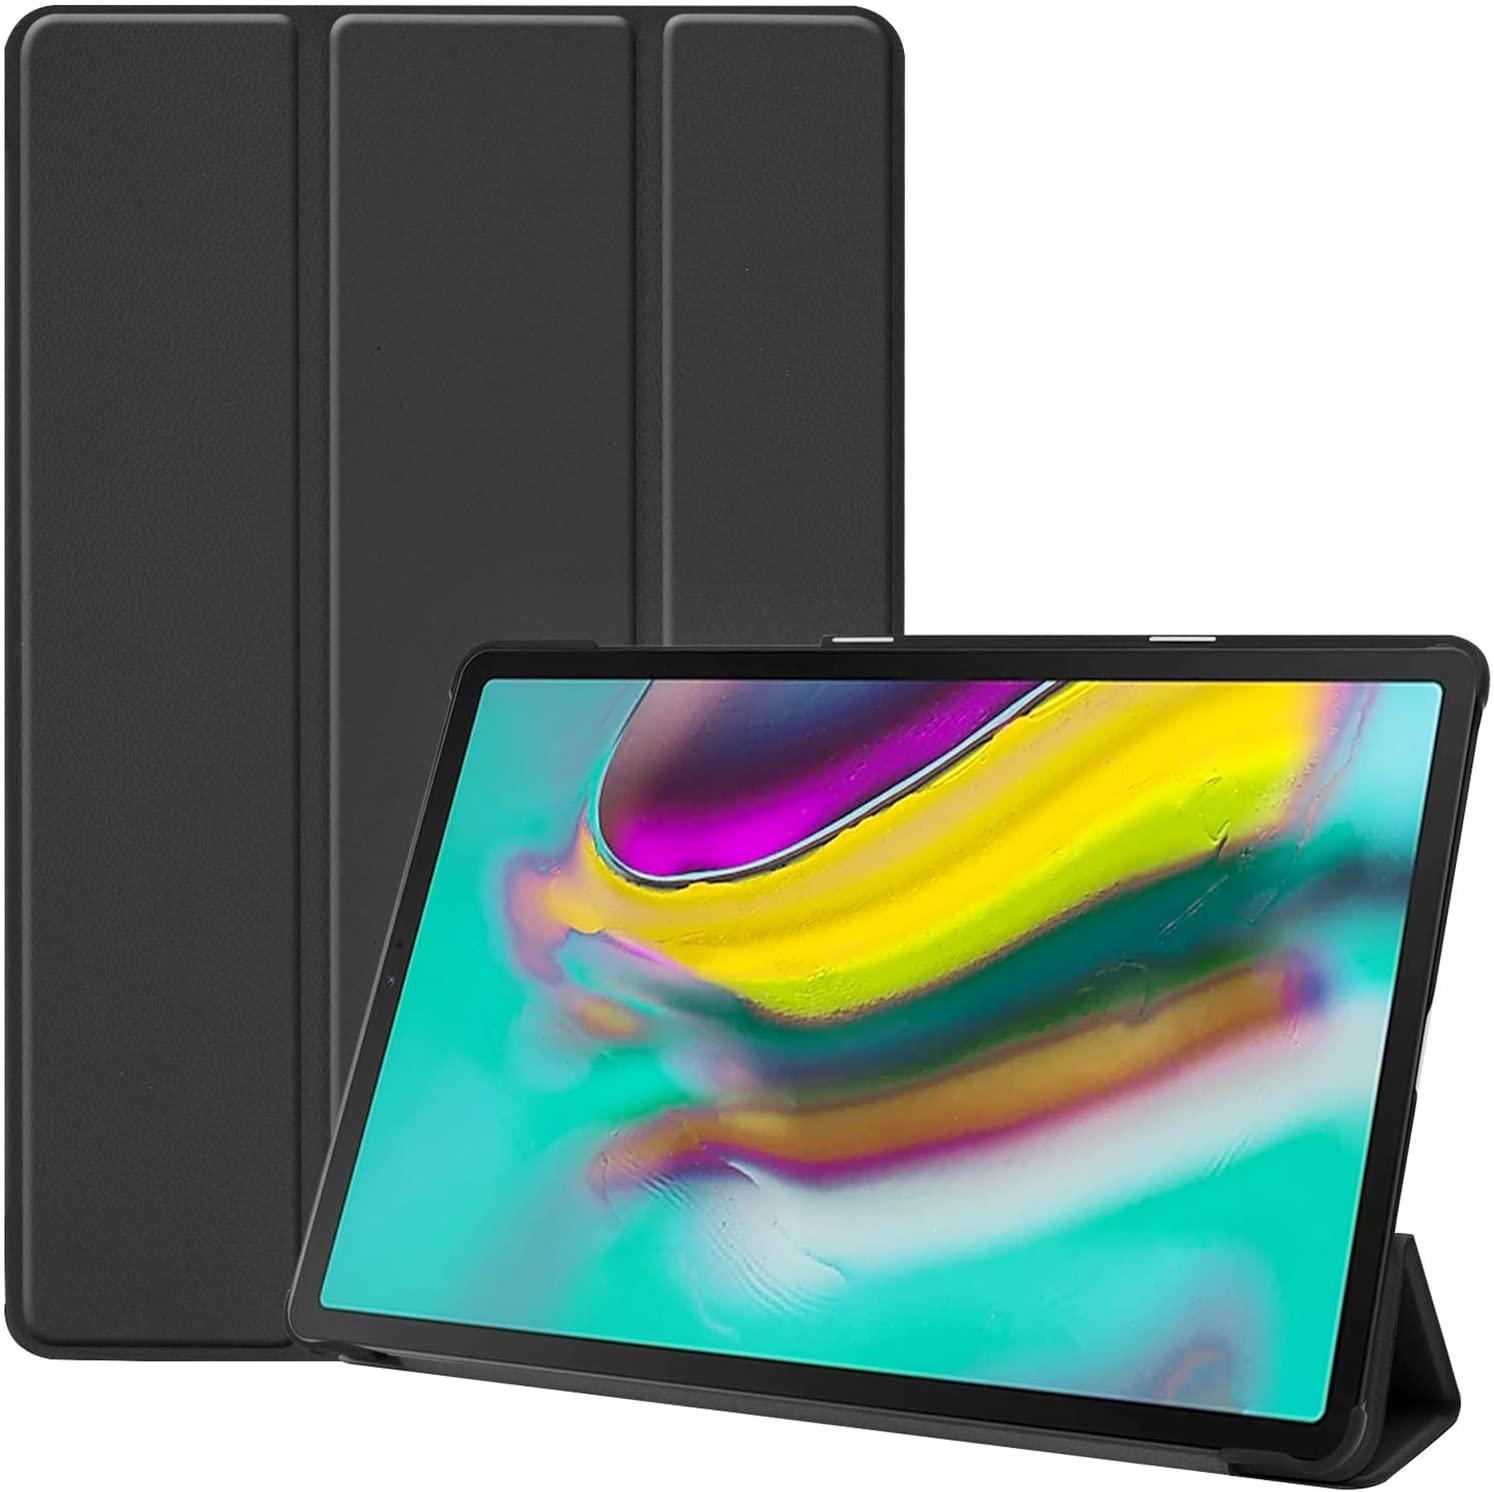 ProCase Galaxy Tab S5e 10.5 2019 T720 T725 T727 Case, Slim Light Cover Stand Hard Shell Folio Case for 10.5 Inch Galaxy Tab S5e Tablet SM-T720 (Wi-Fi) SM-T725 (LTE) SM-T727 2019 Release –Black